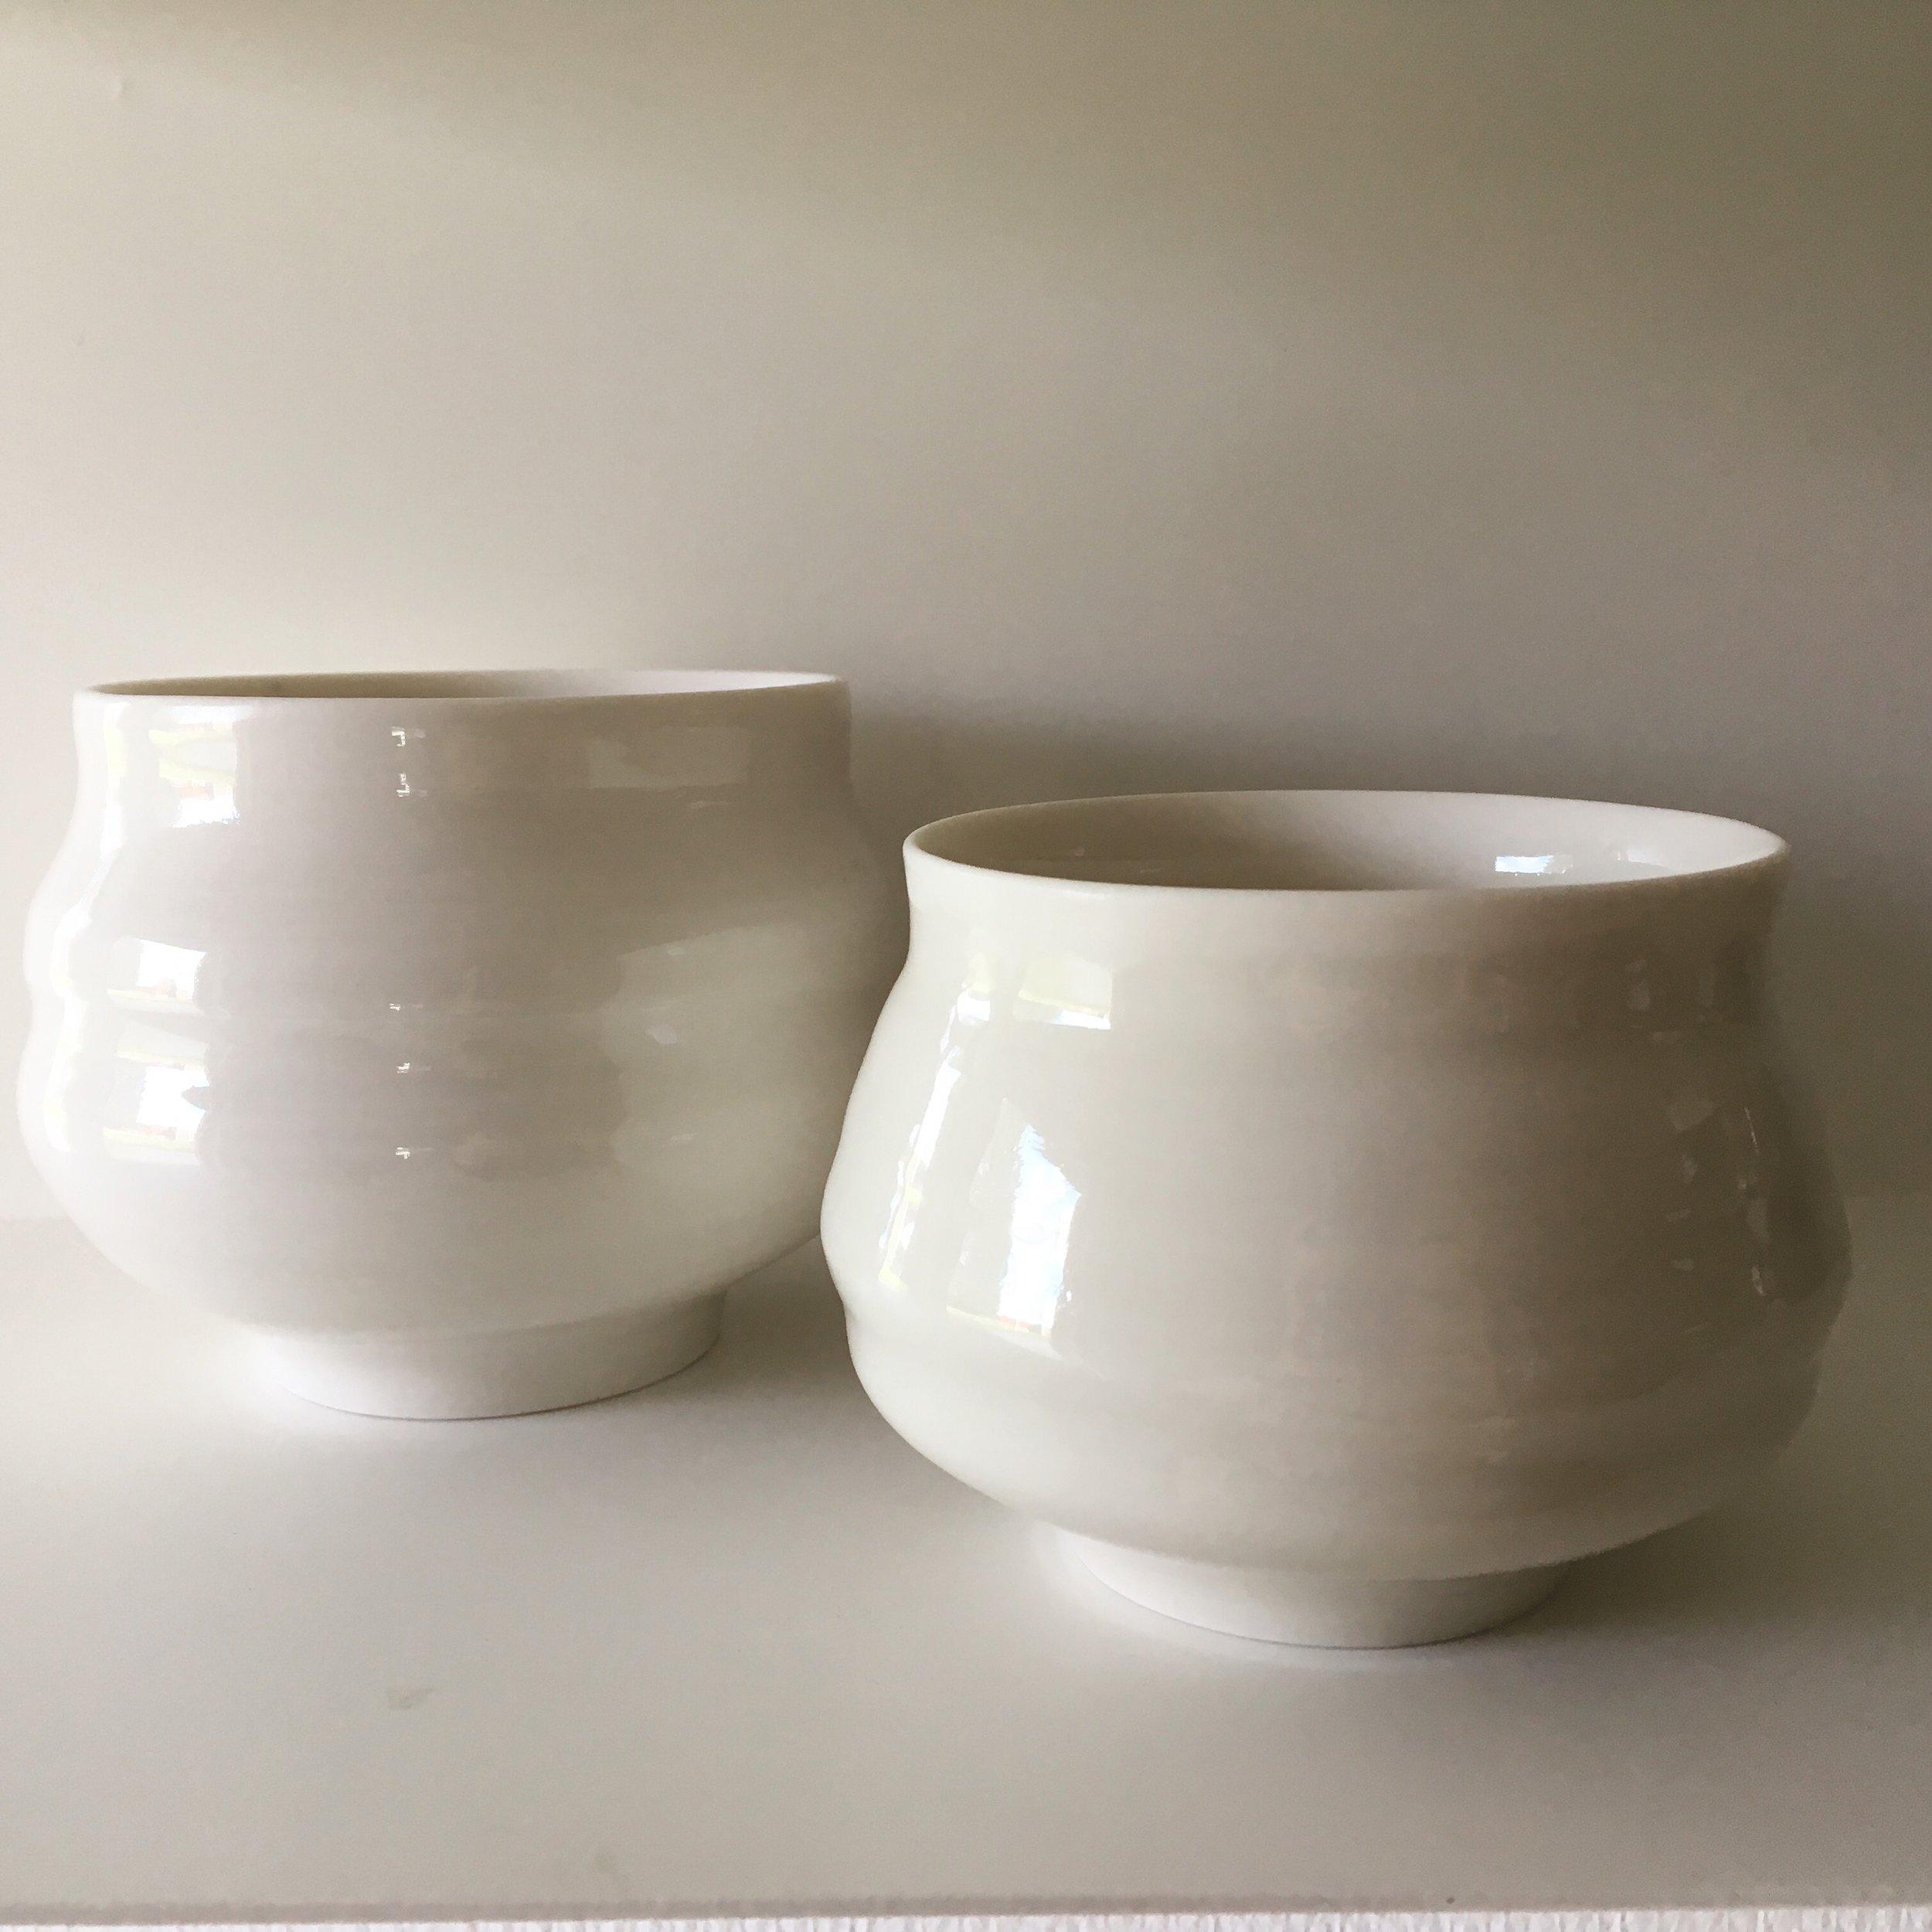 Porcelain chawan   Various porcelain chawan tea bowls with transparent glaze.  Ø 9-11cm - €30-55